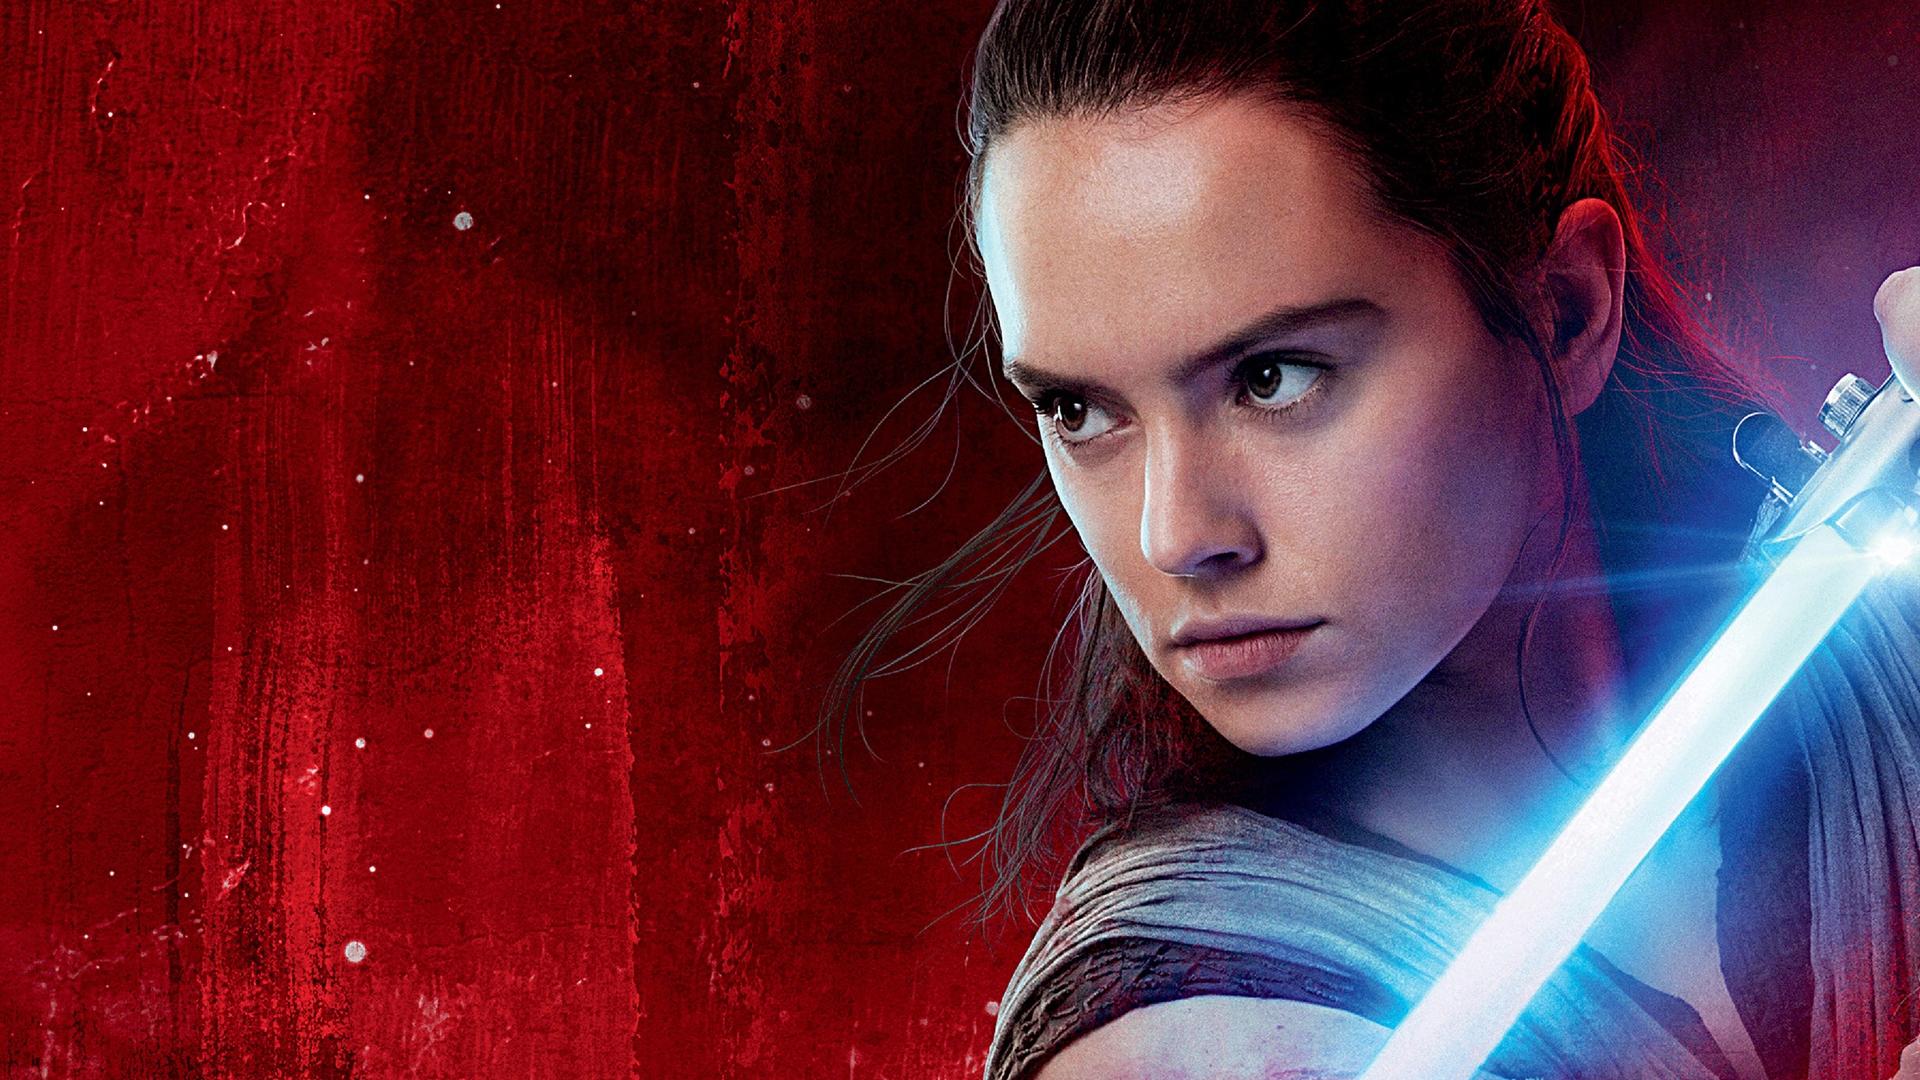 80 Star Wars Rey Wallpapers On Wallpapersafari